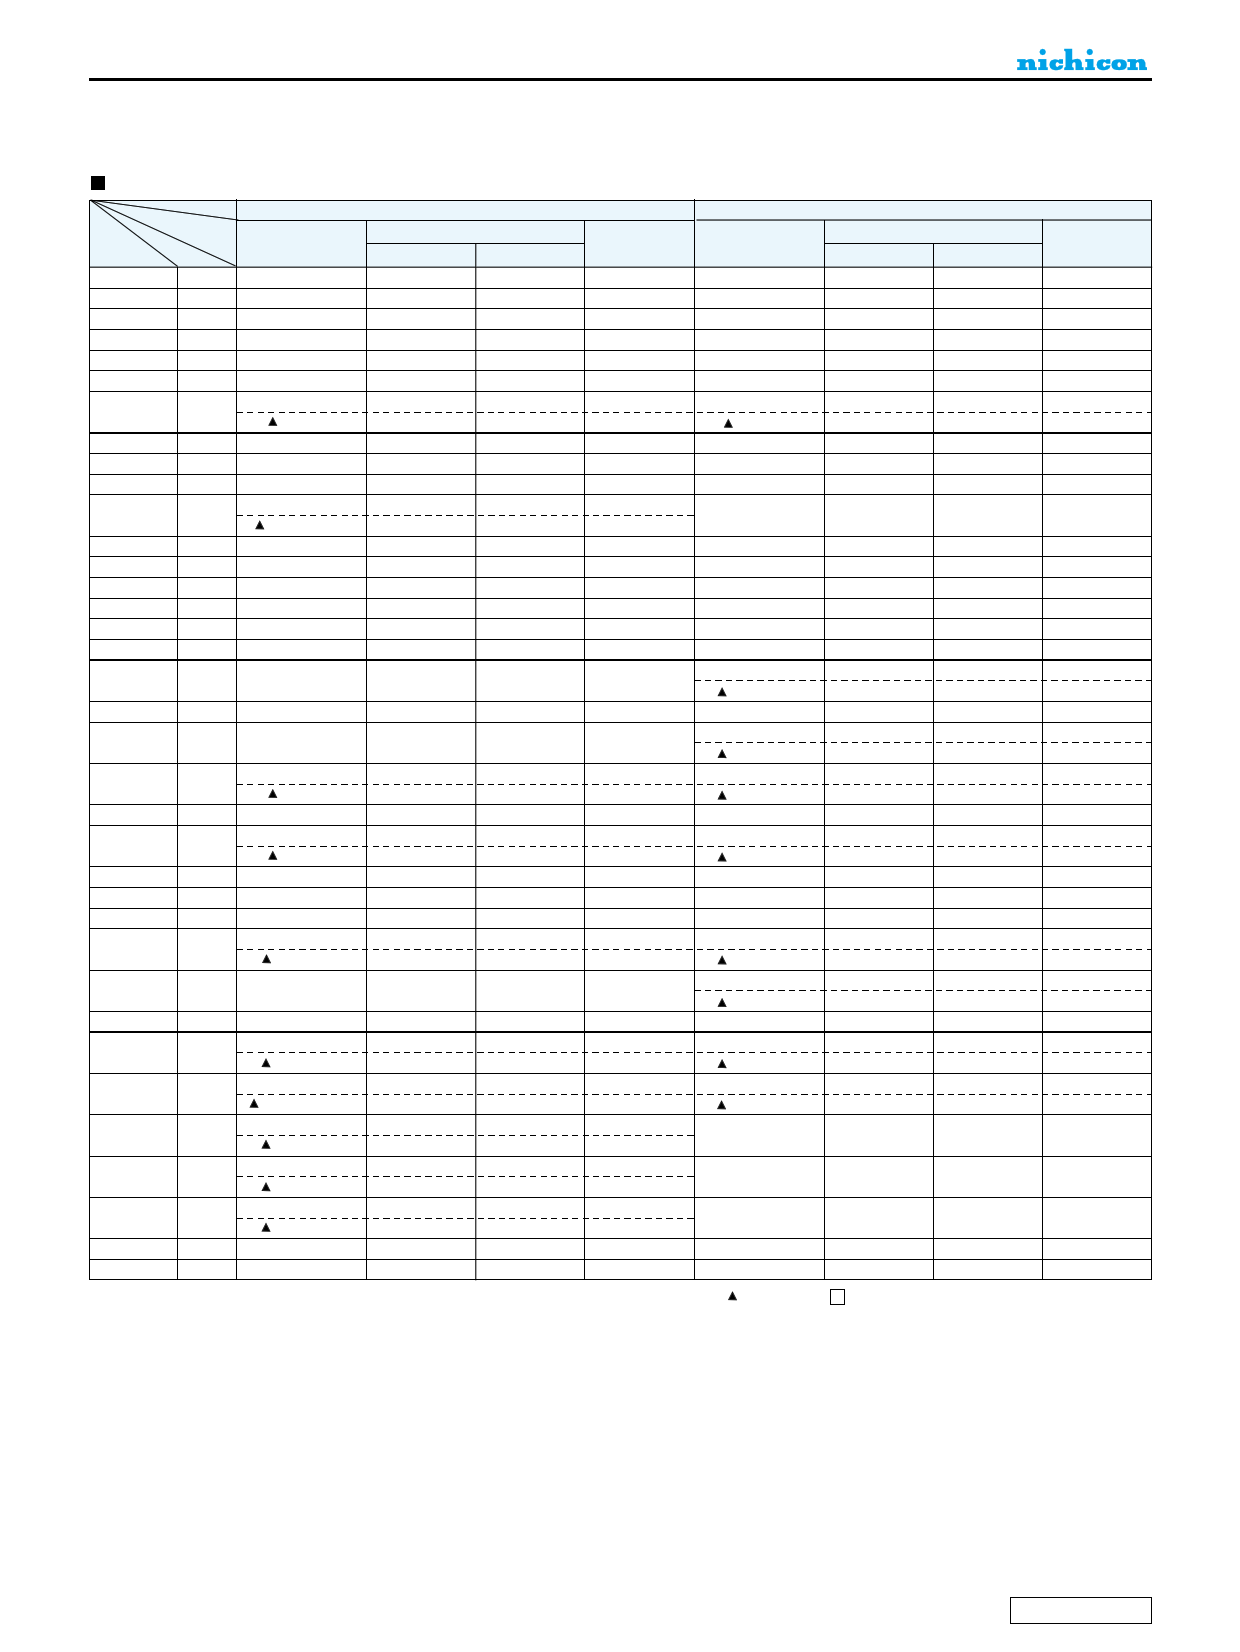 UPW1C222MHH pdf, 반도체, 판매, 대치품